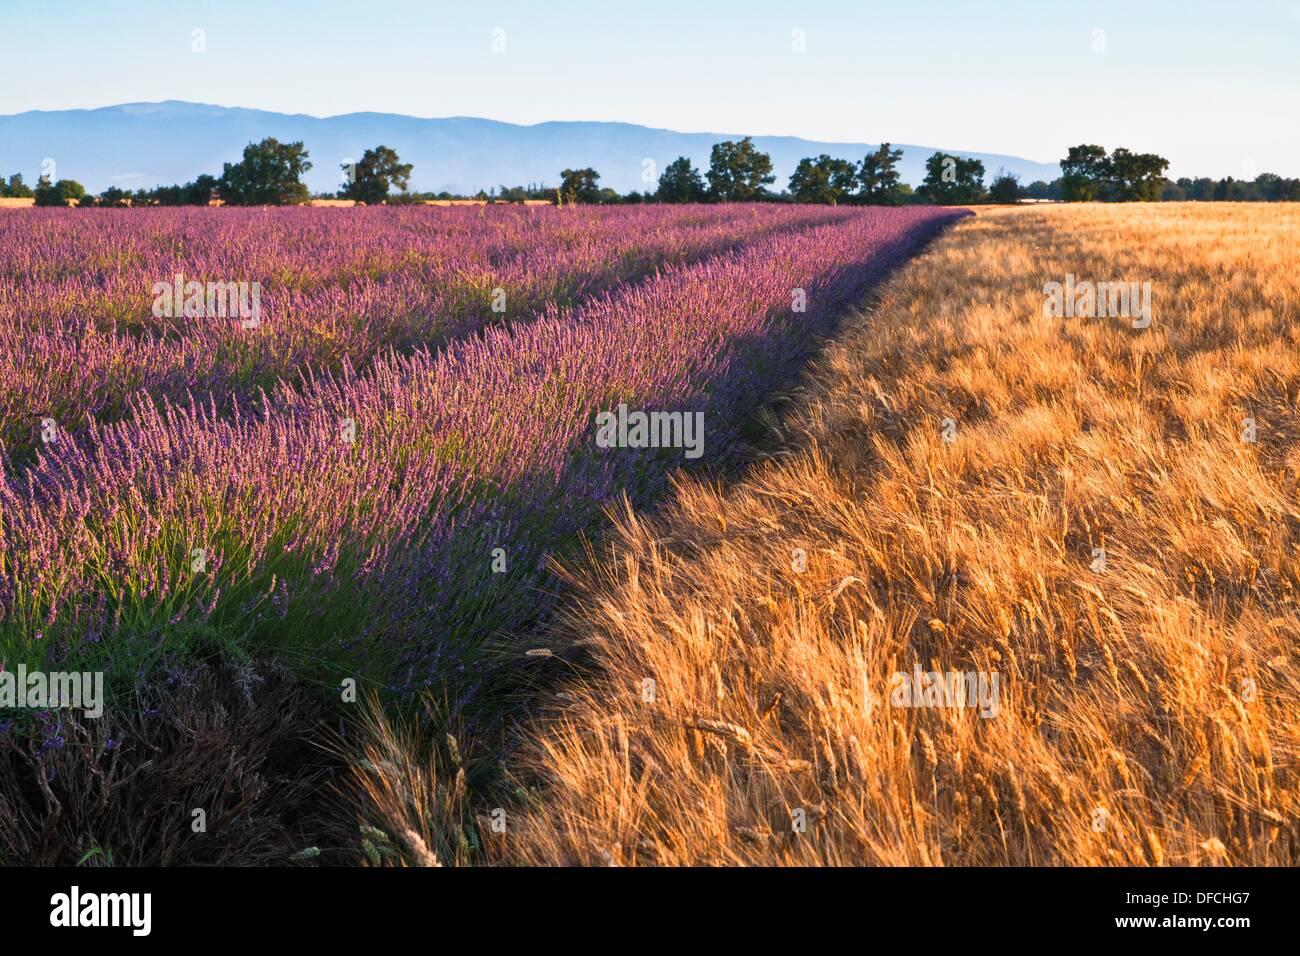 Lavender field at sunrise, Provence, France, Europe - Stock Image